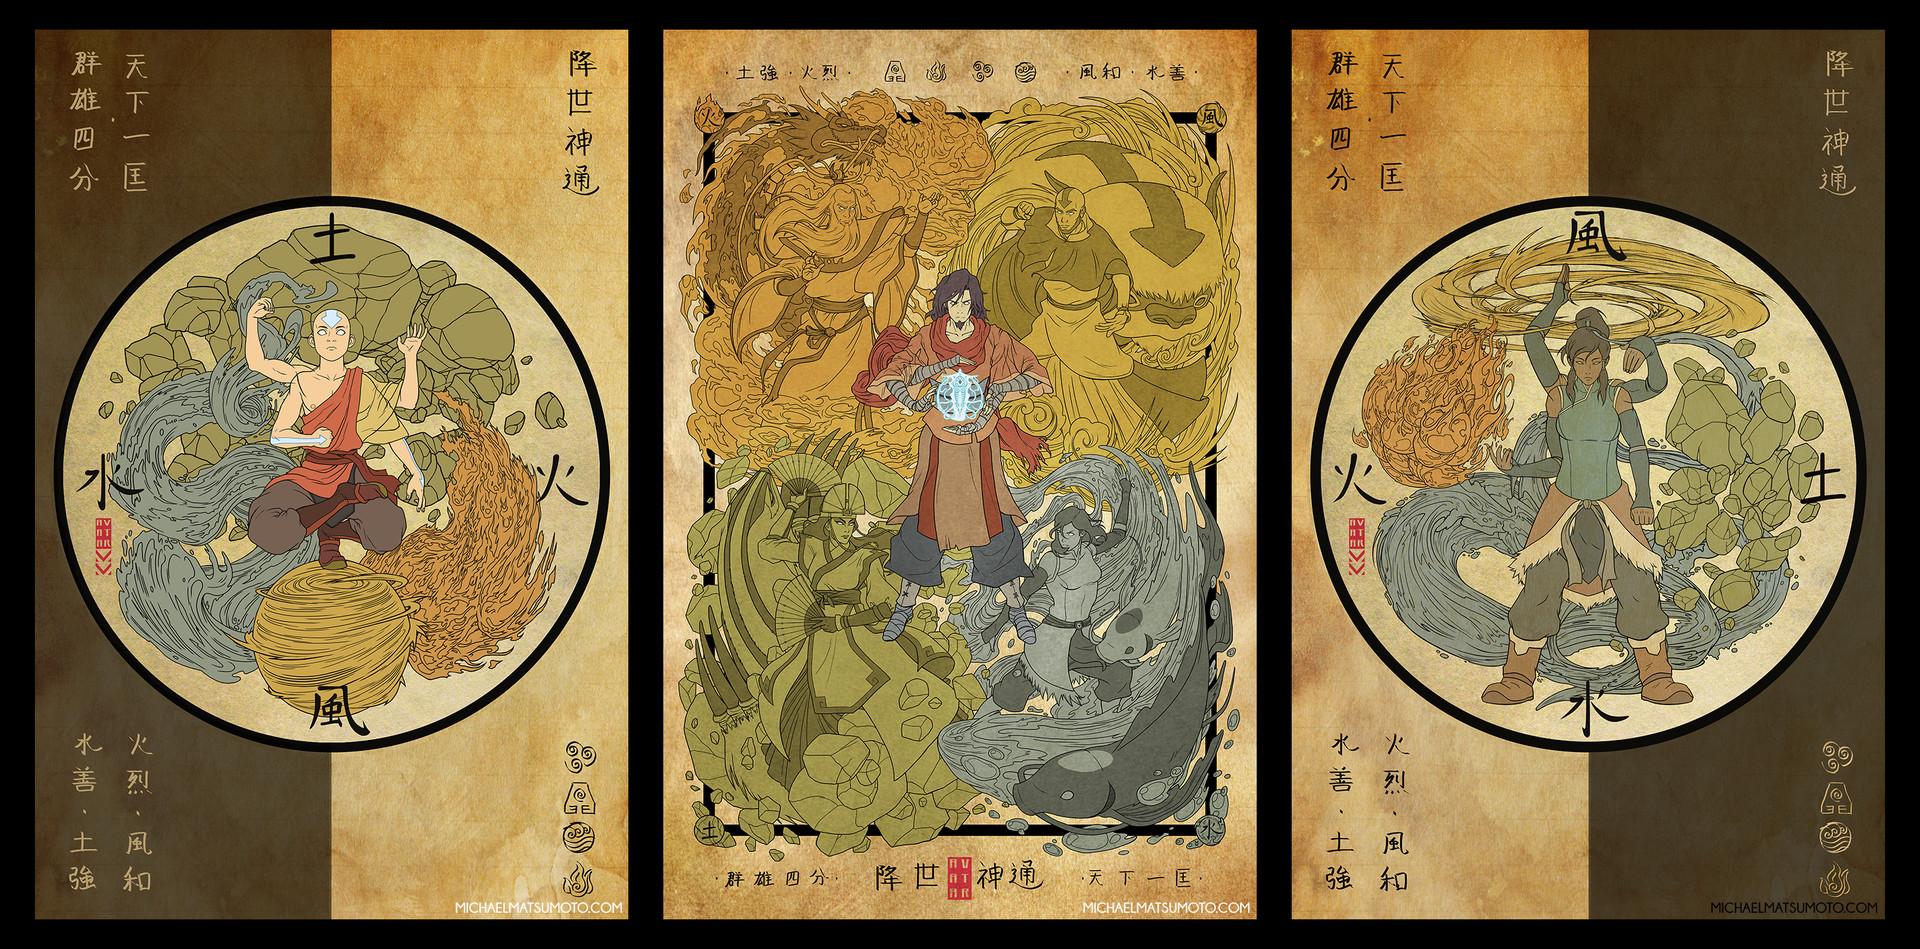 Michael matsumoto triptych watermark